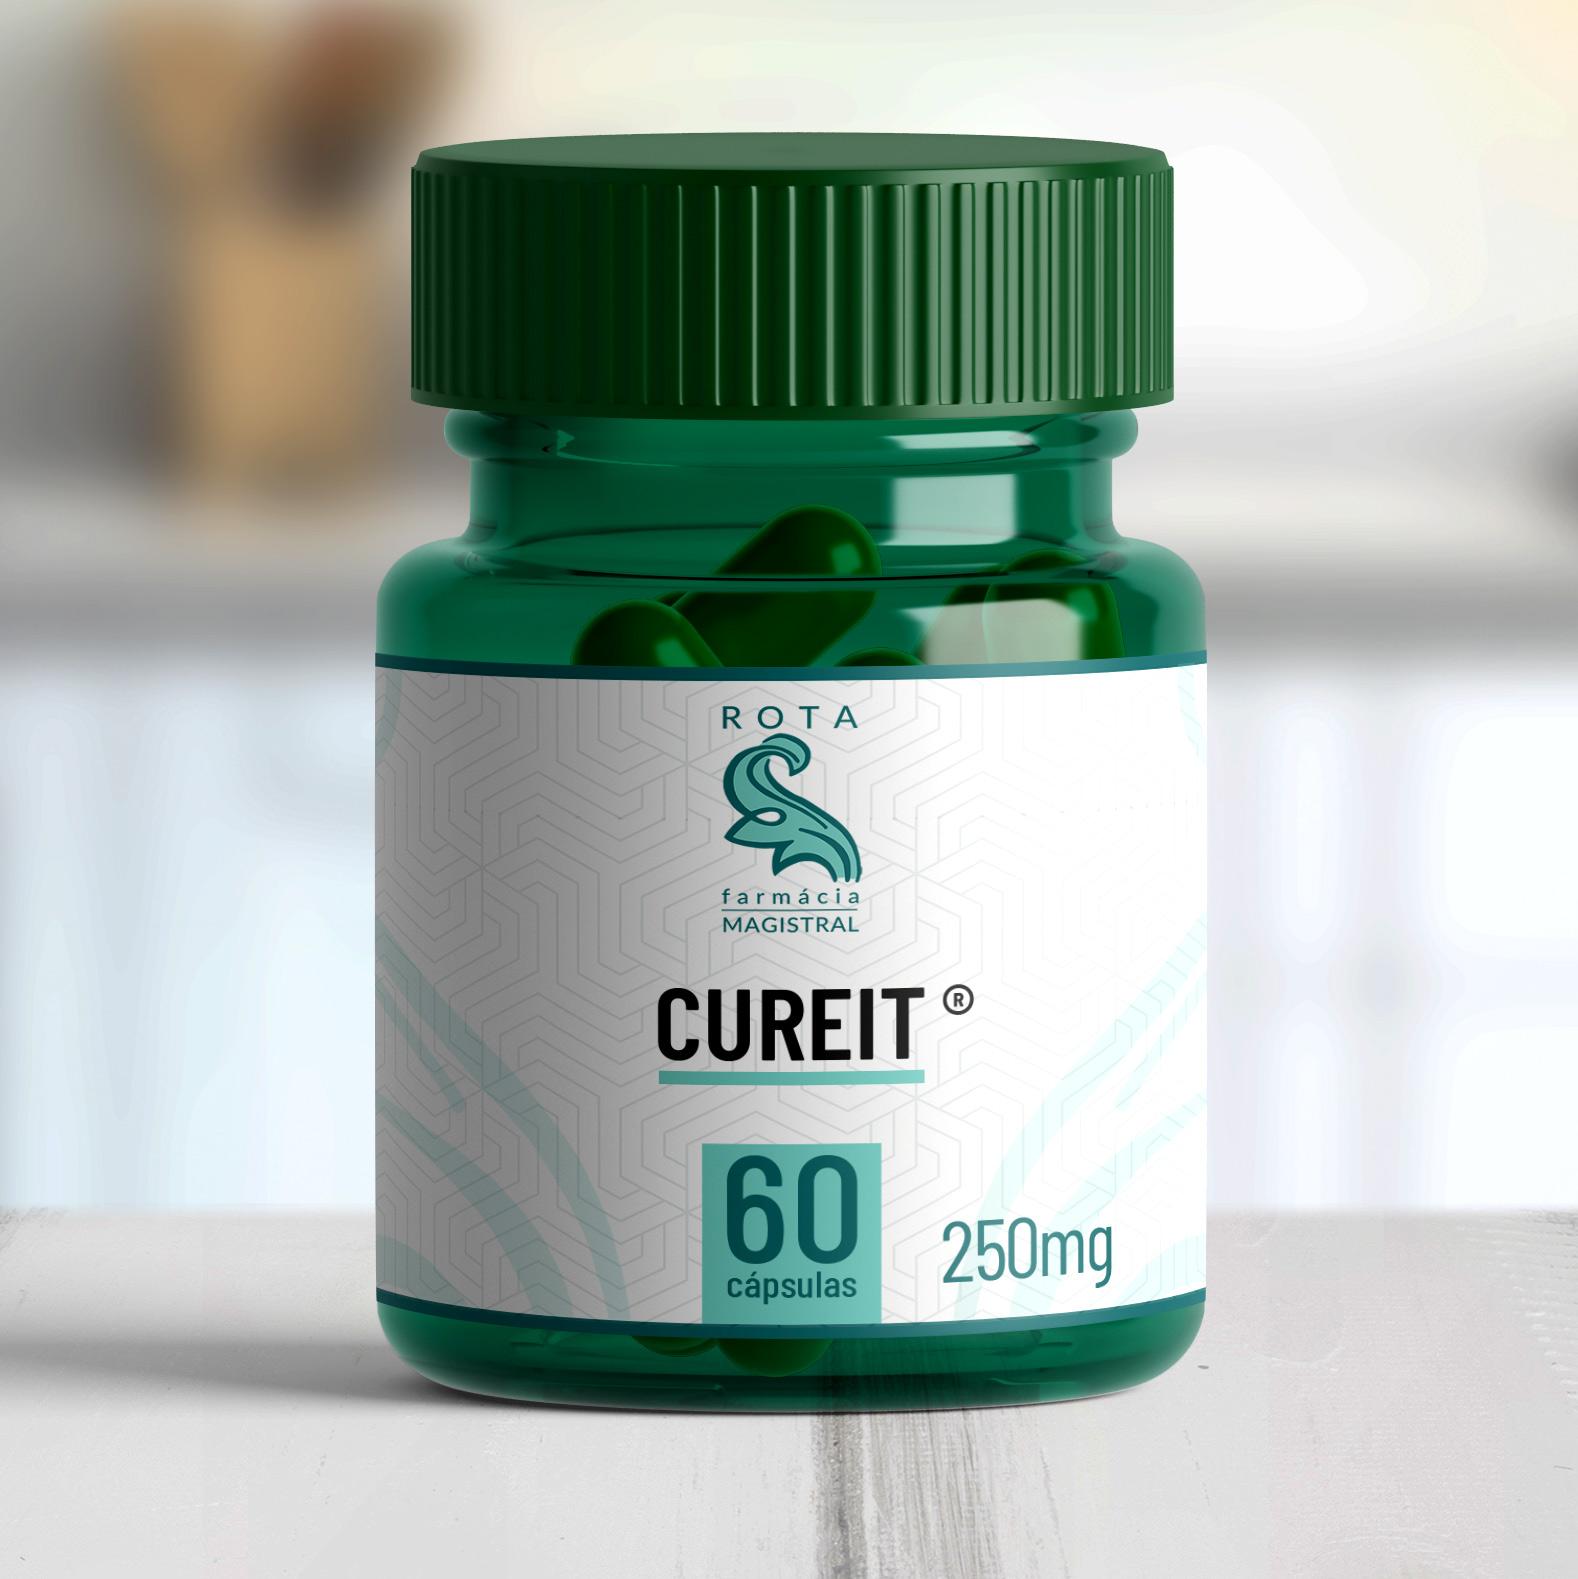 Cureit ® 250mg 60 cápsulas